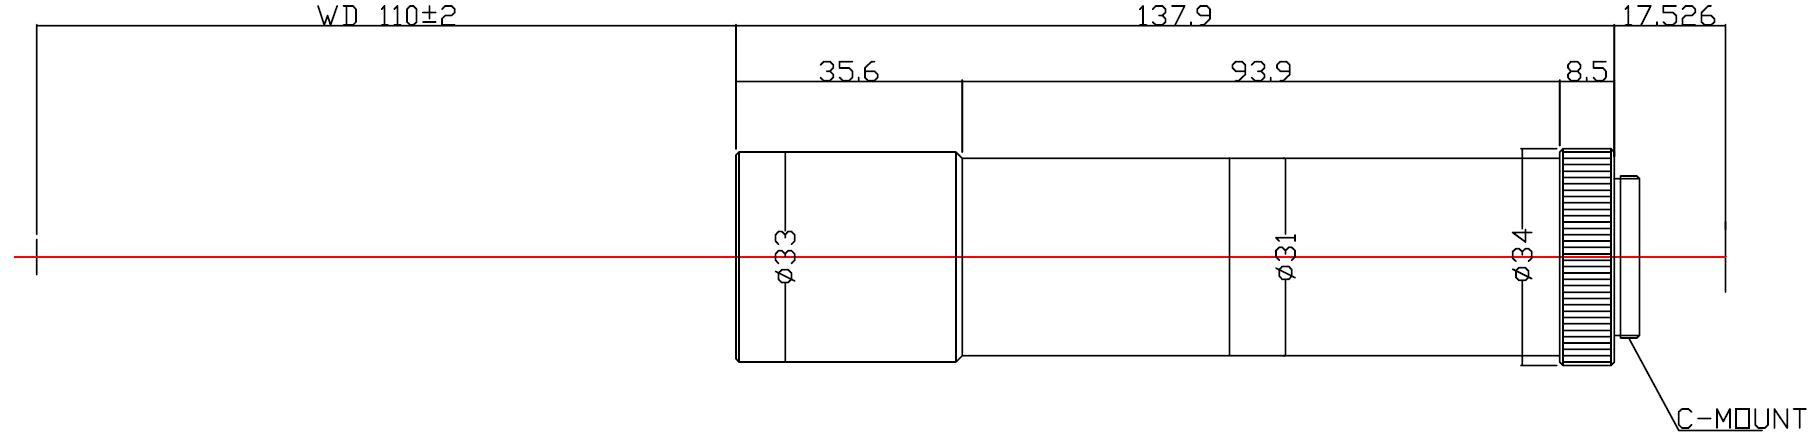 Lensagon TCHR-30-110